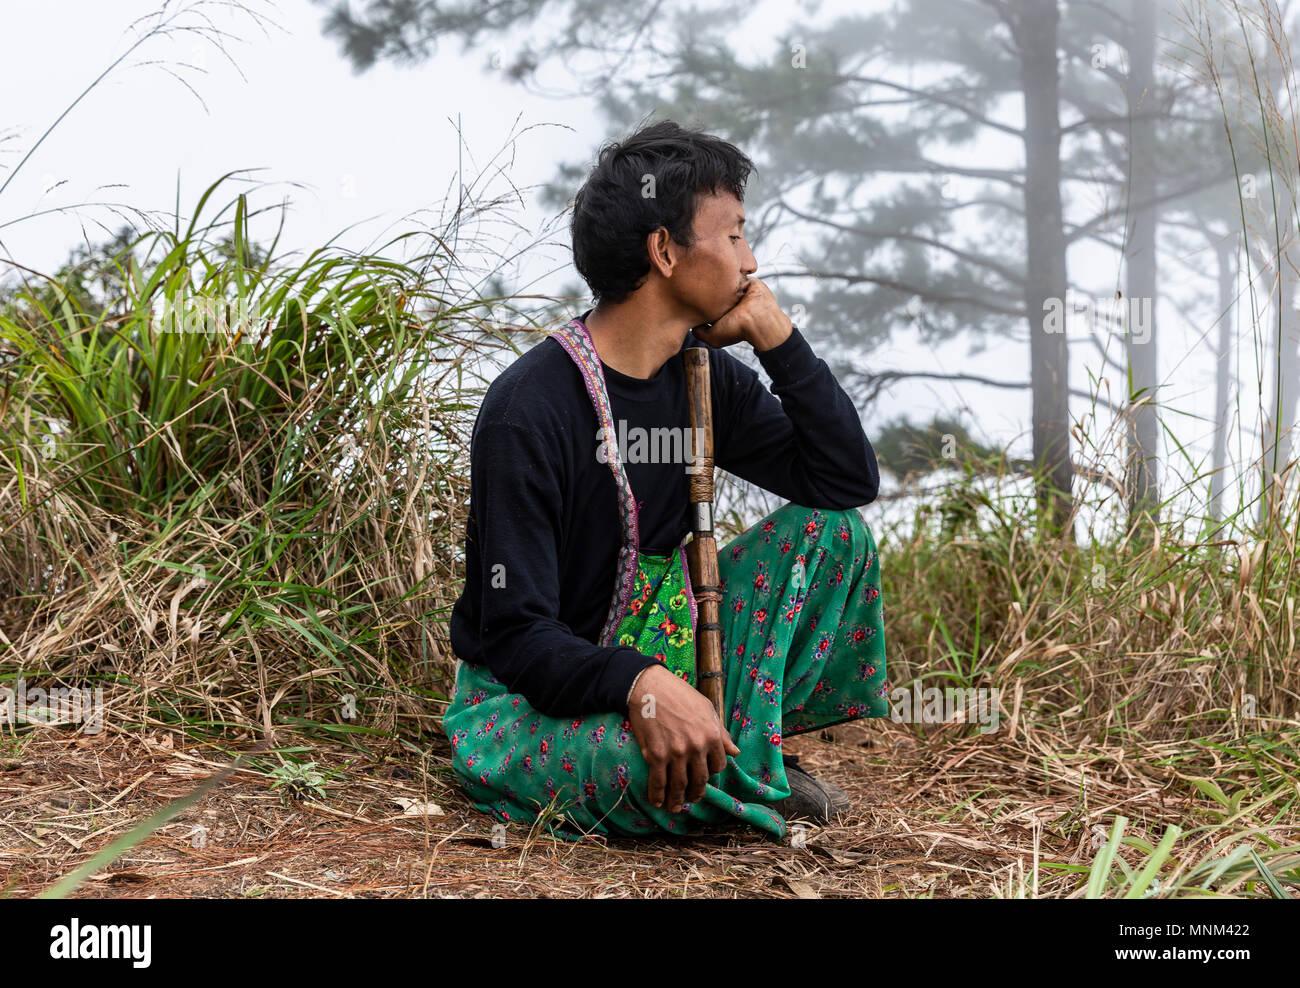 Thai hilltribe park ranger in Khun Chae National Park (อุทยานแห่งชาติขุนแจ) in Northern Thailand - Stock Image